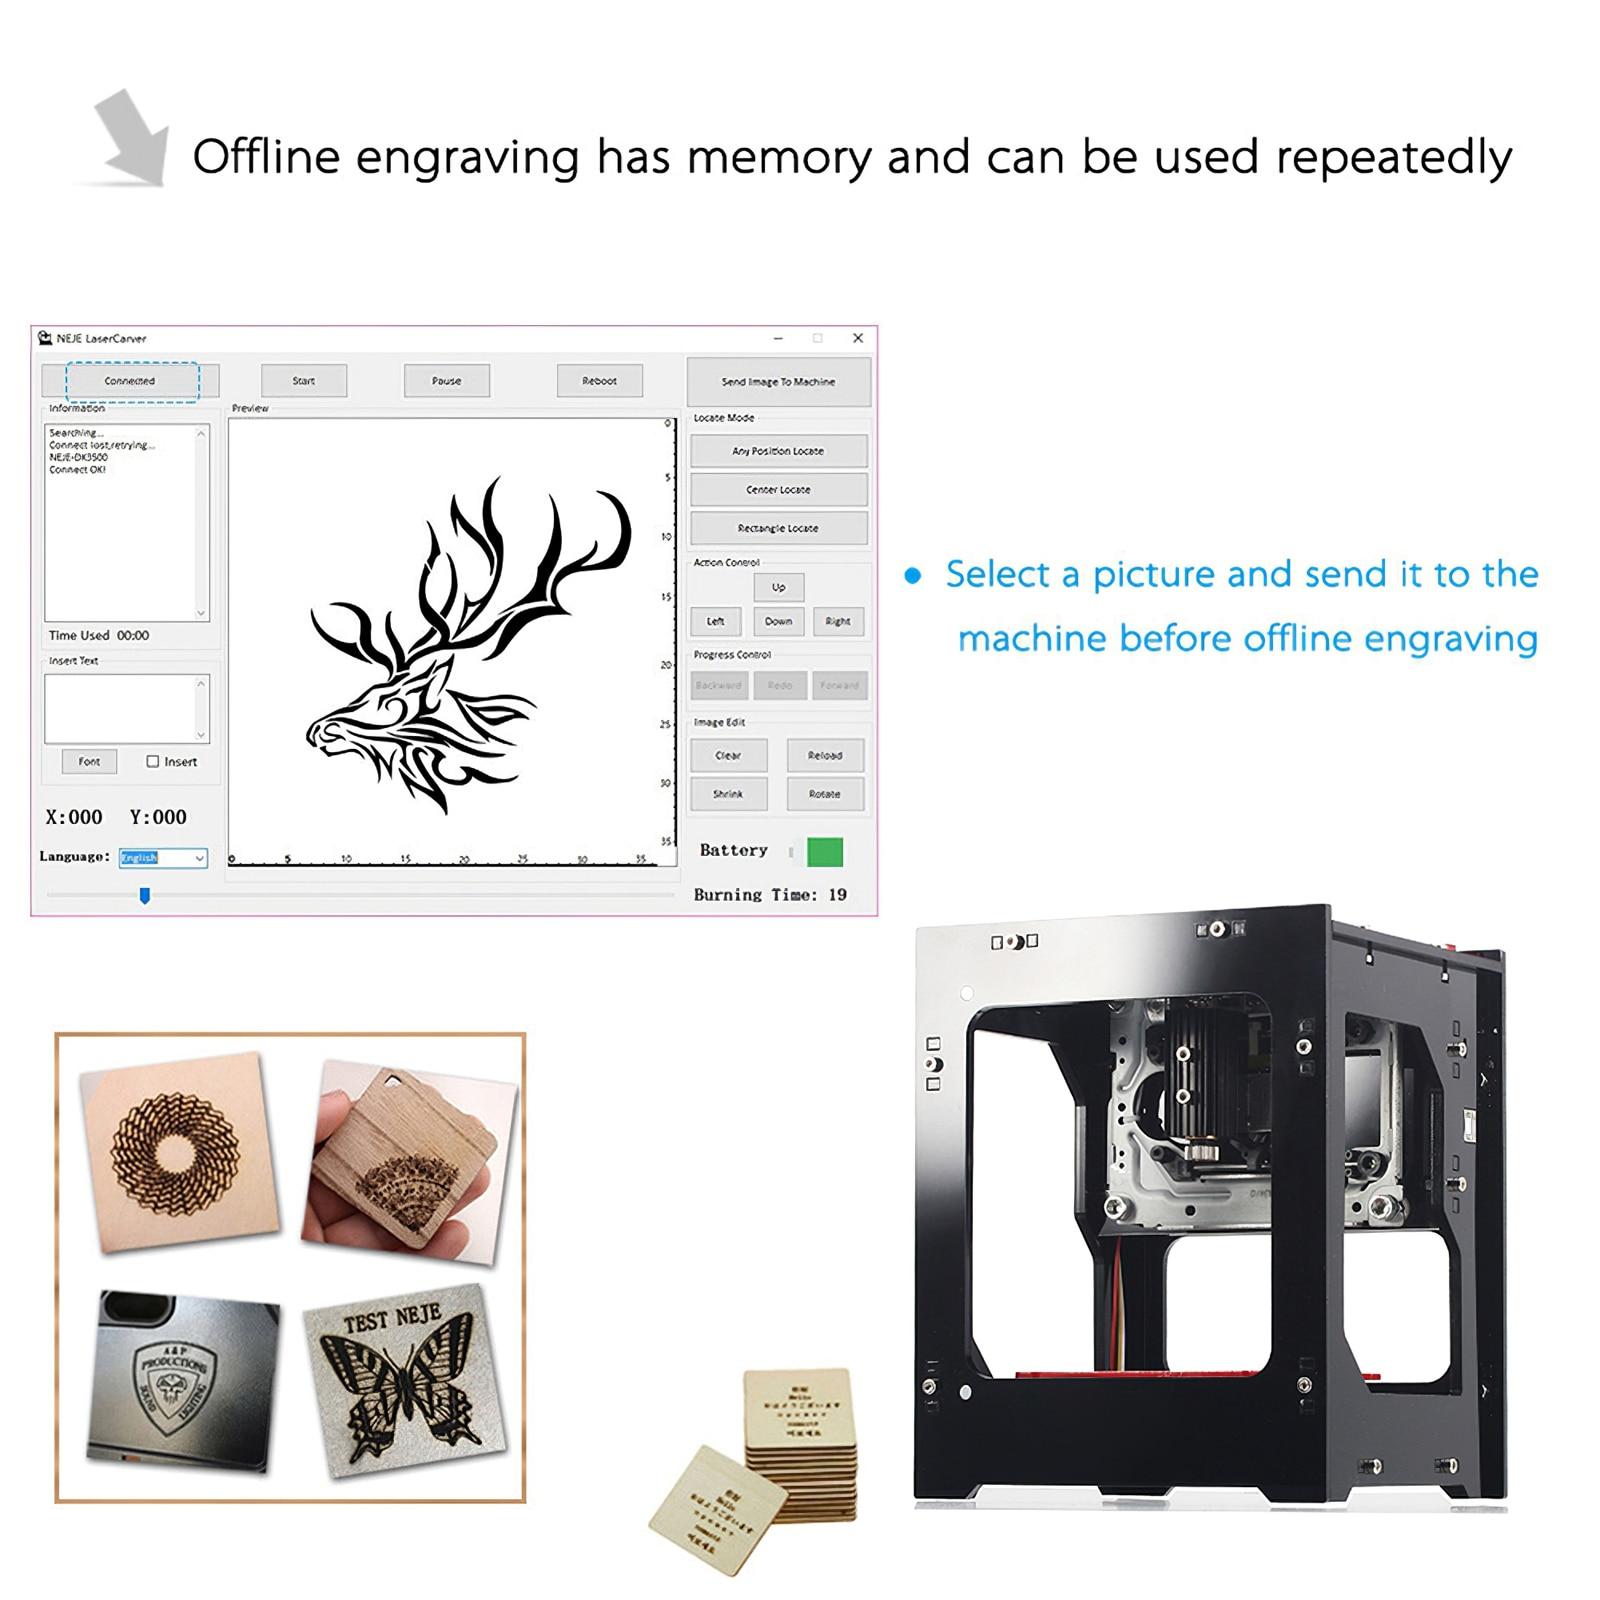 NEJE DK-BL 3000mW Laser Engraver 445nm AI Mini Engraving Machine Wireless Bluetooth4.0 USB Connection CNC Laser Cutter Print enlarge